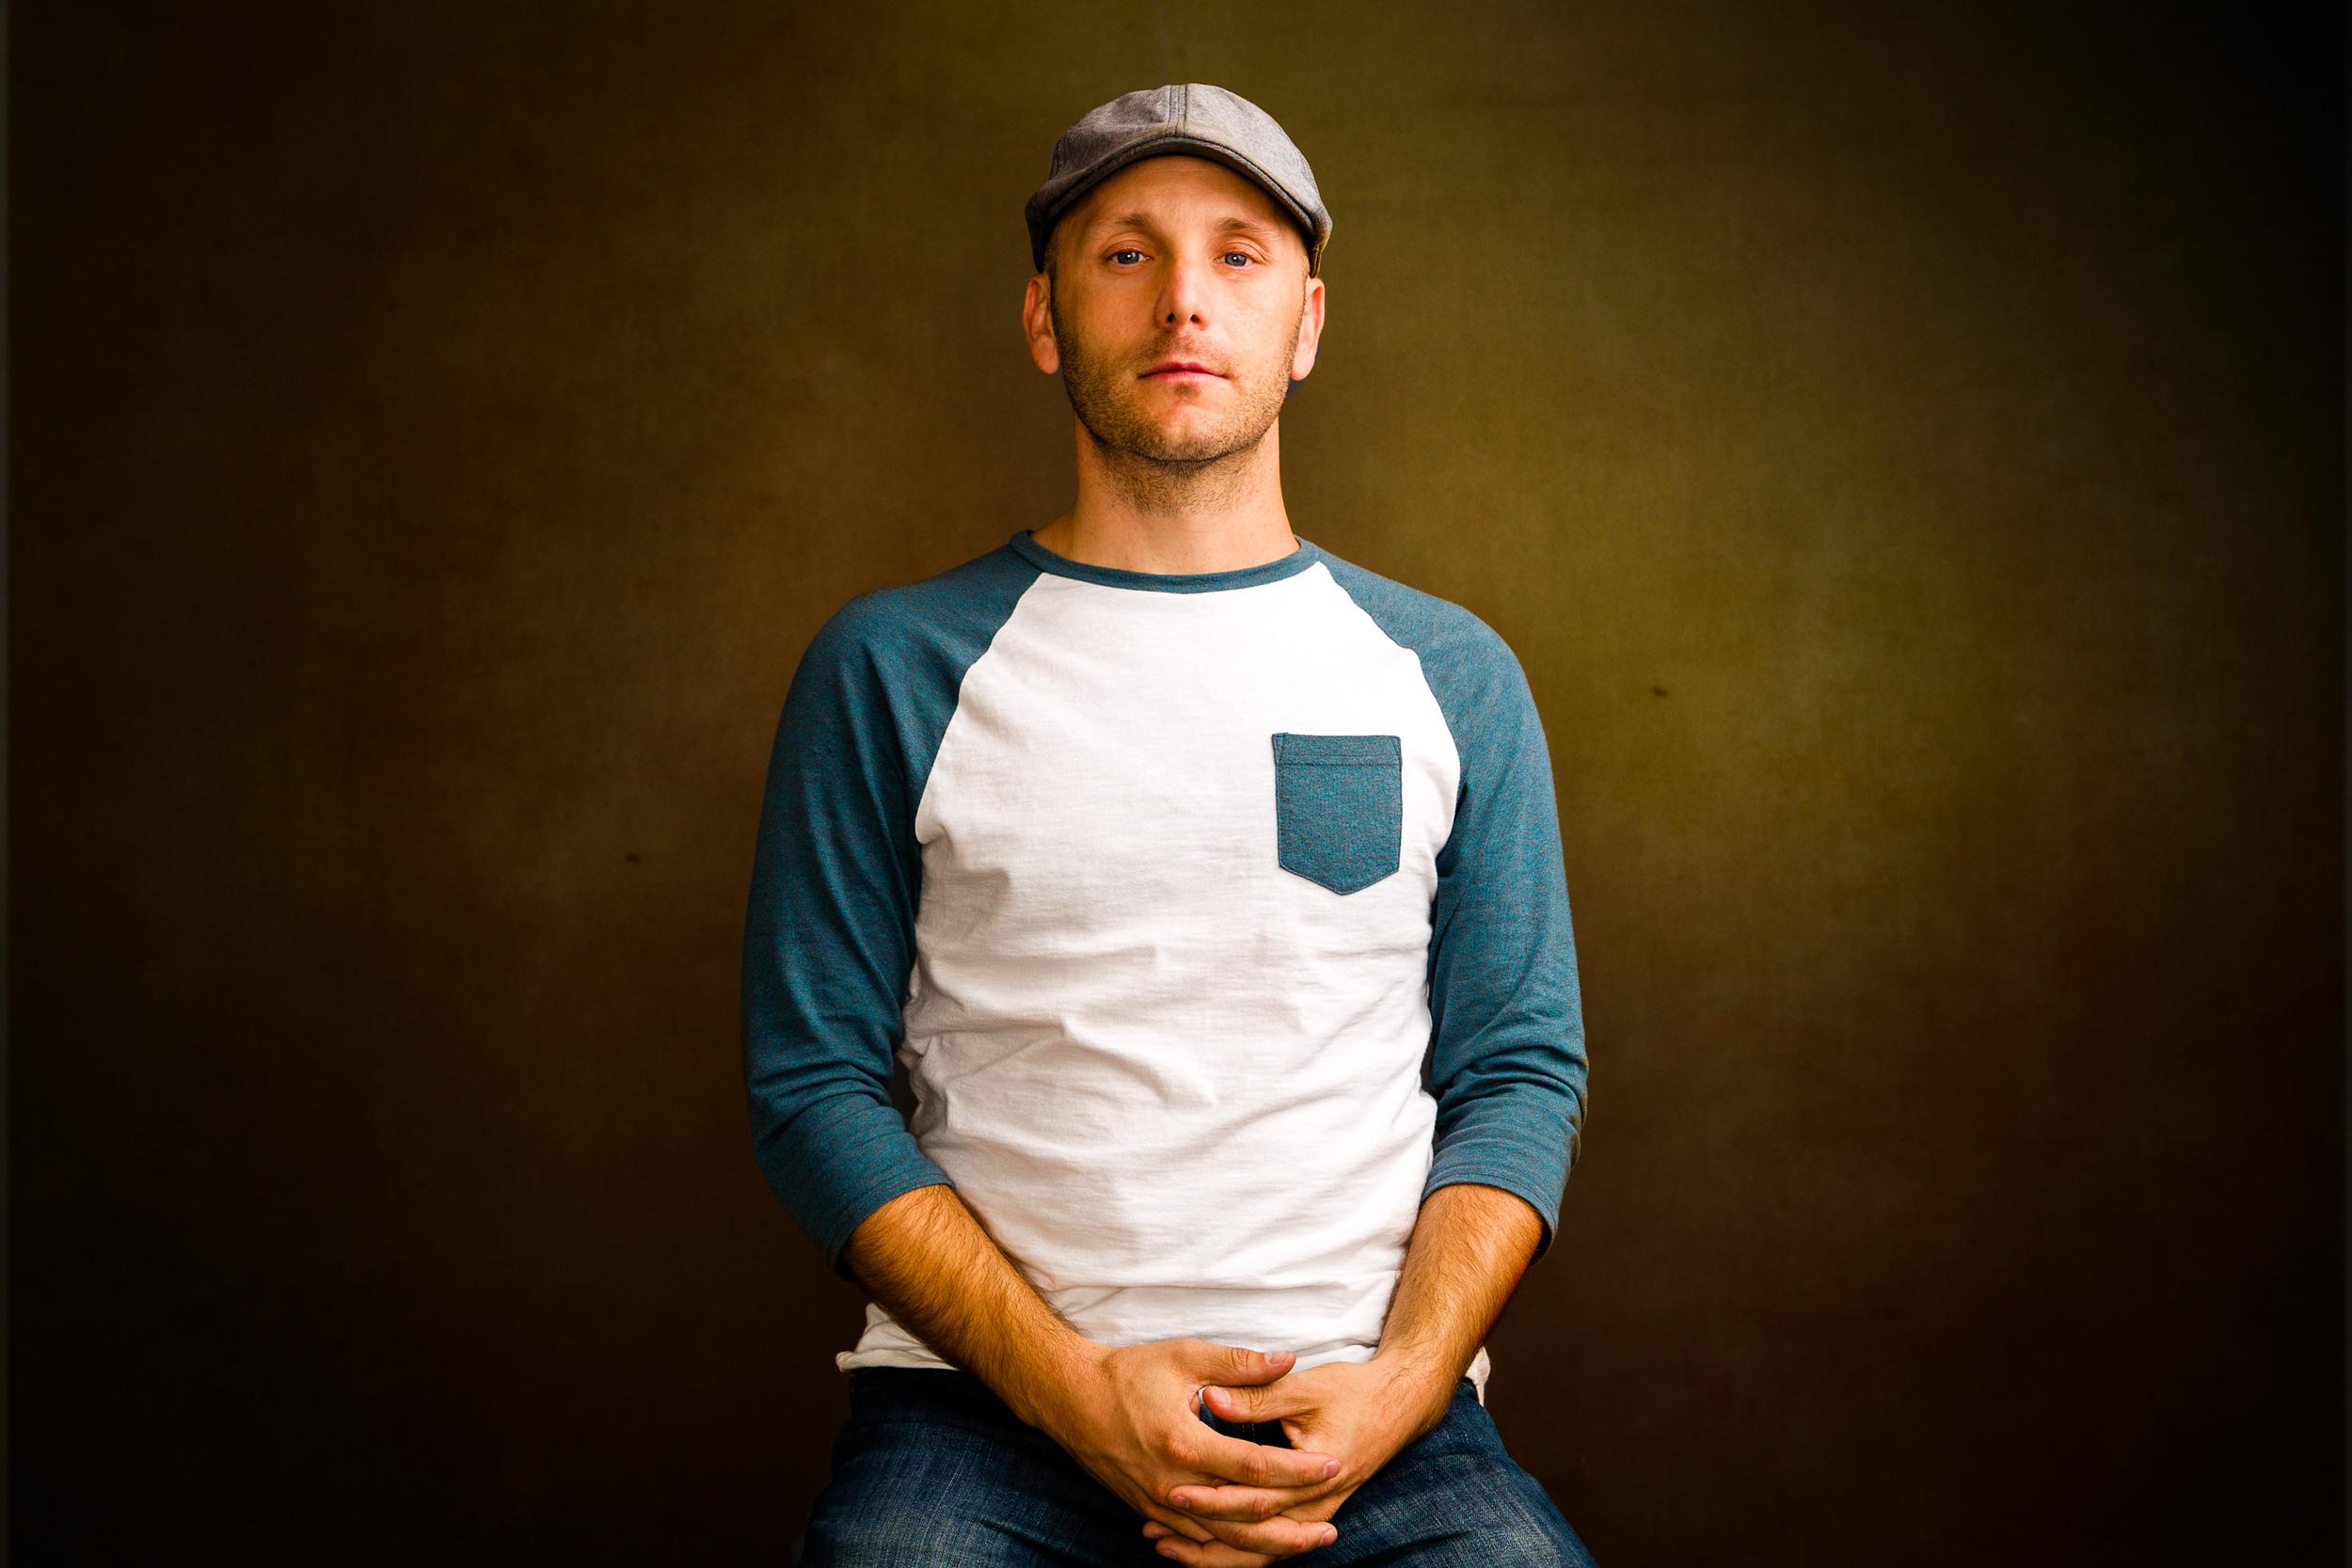 Self Portrait - Jeremy Shockley 2016